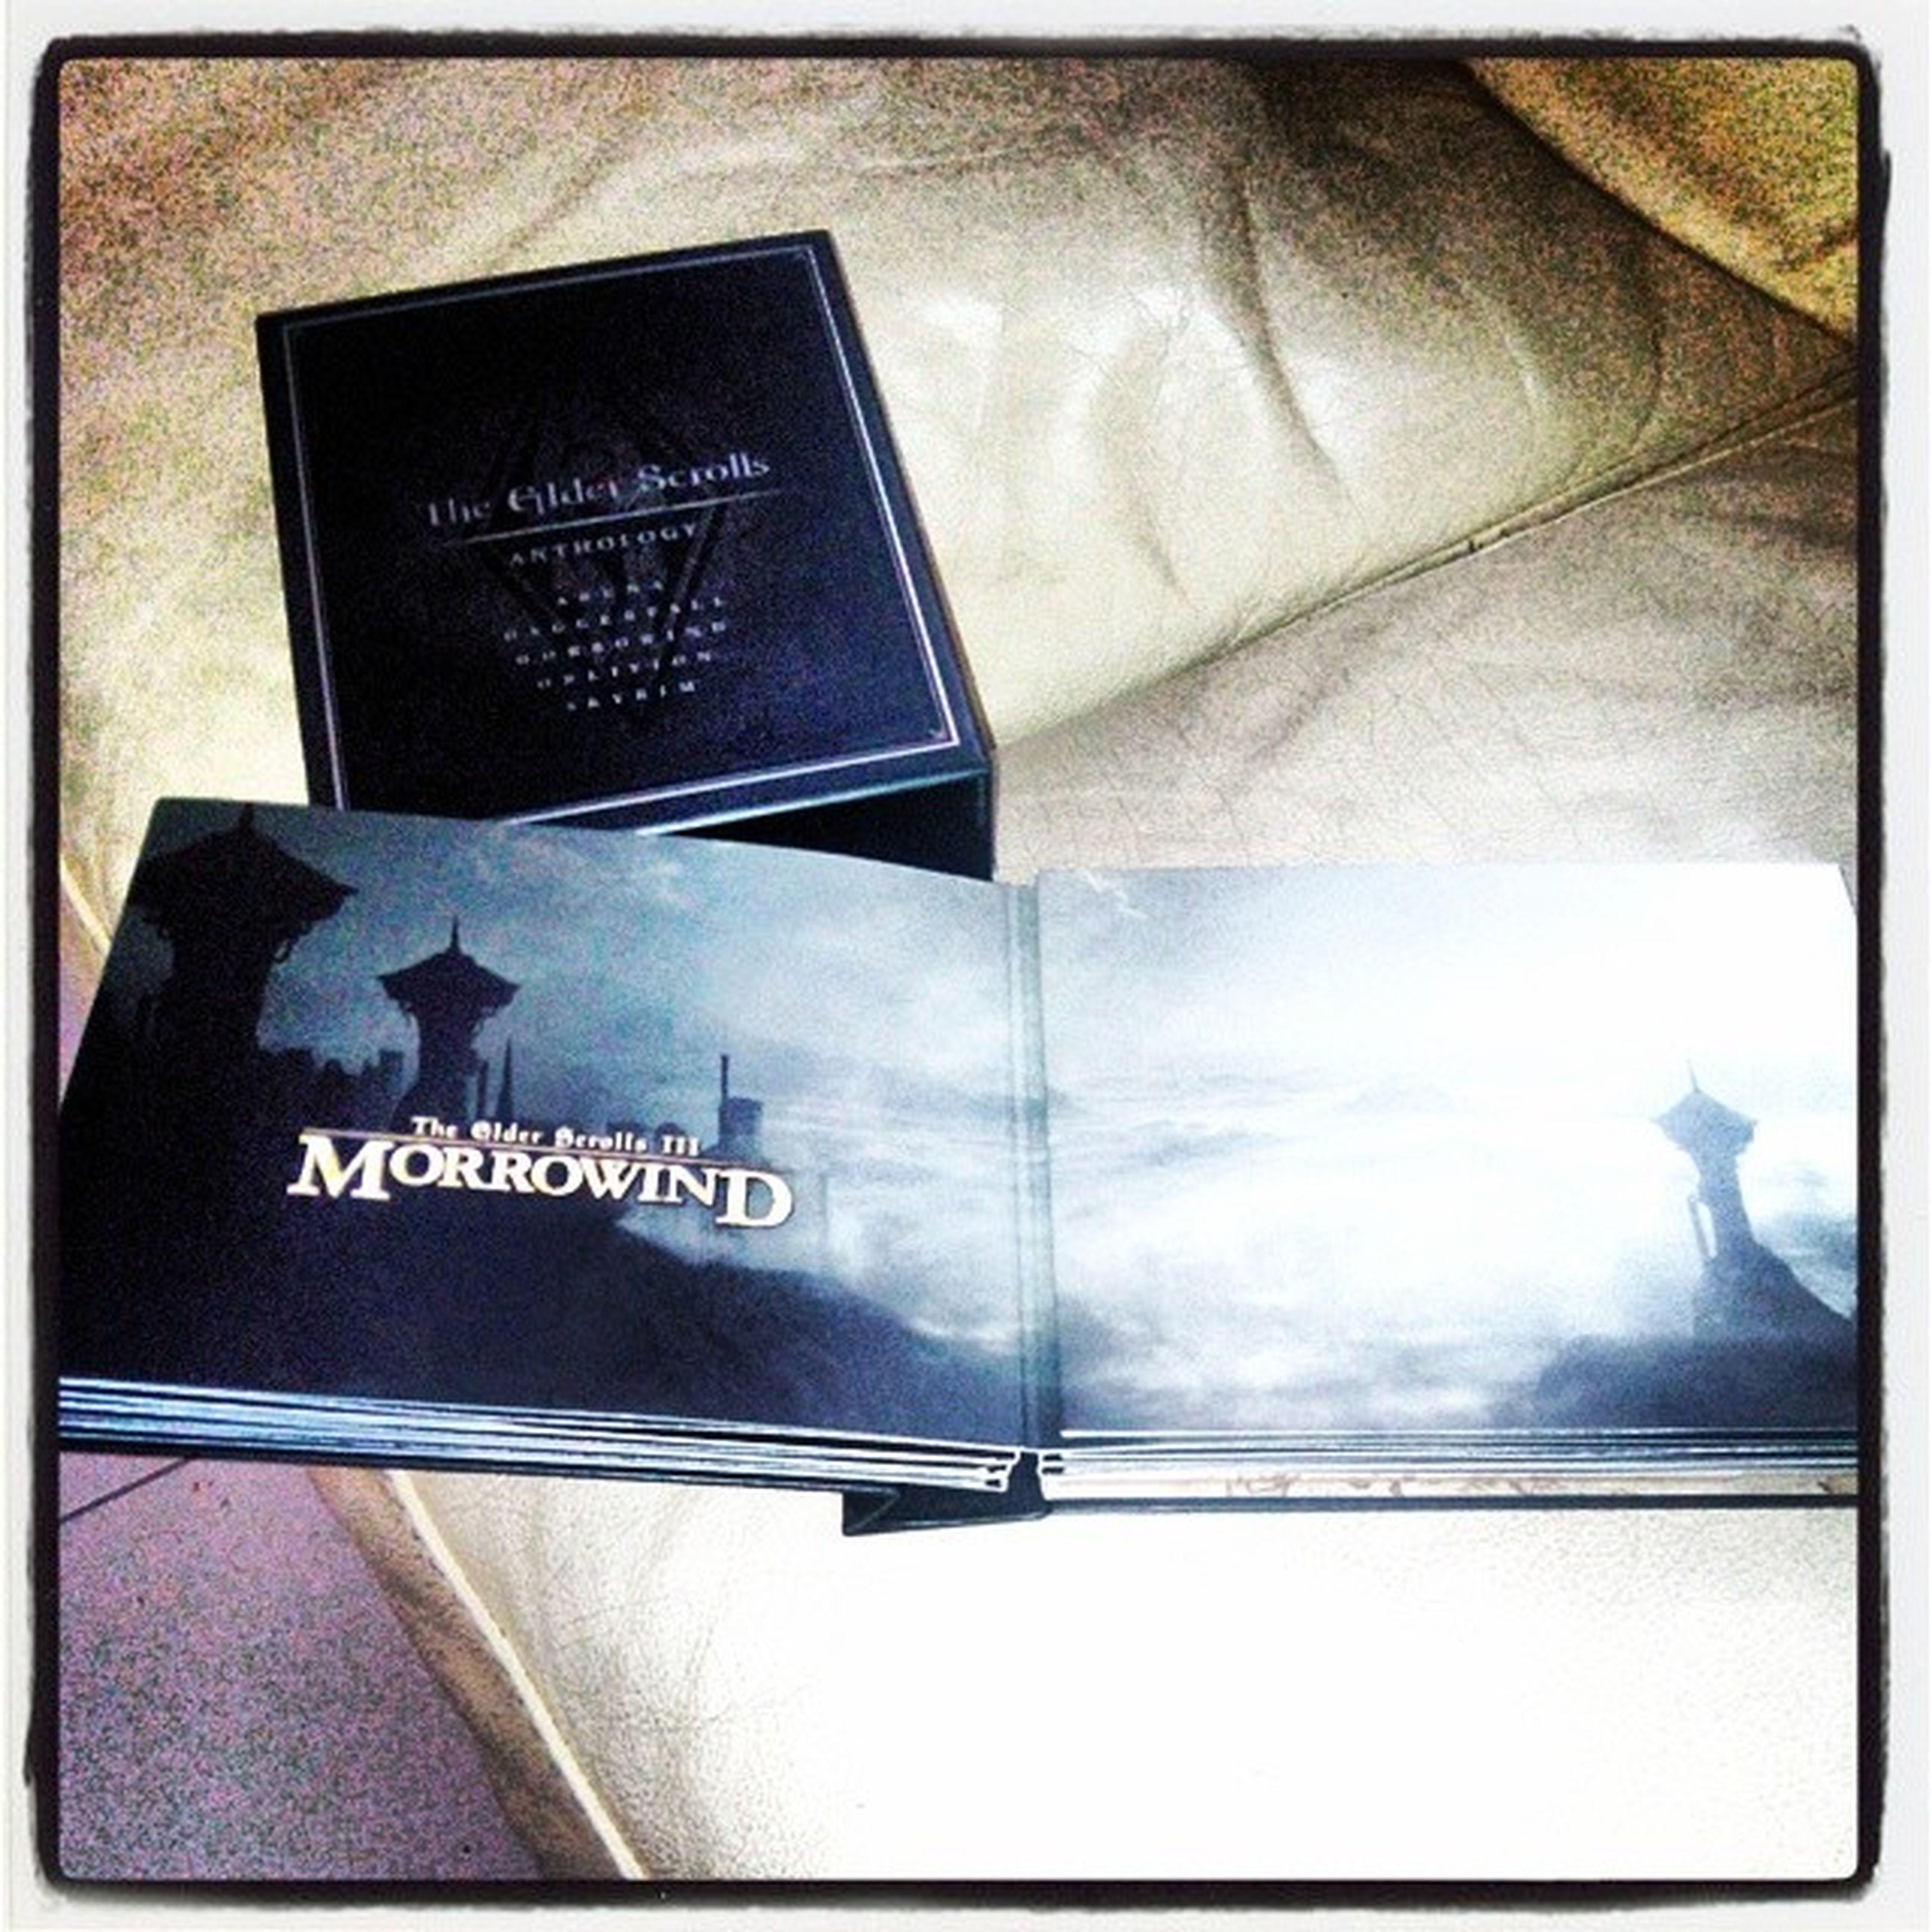 Game Theelderscrolls Anthology coffret intégrale Arena daggerfall morrowind oblivion skyrim